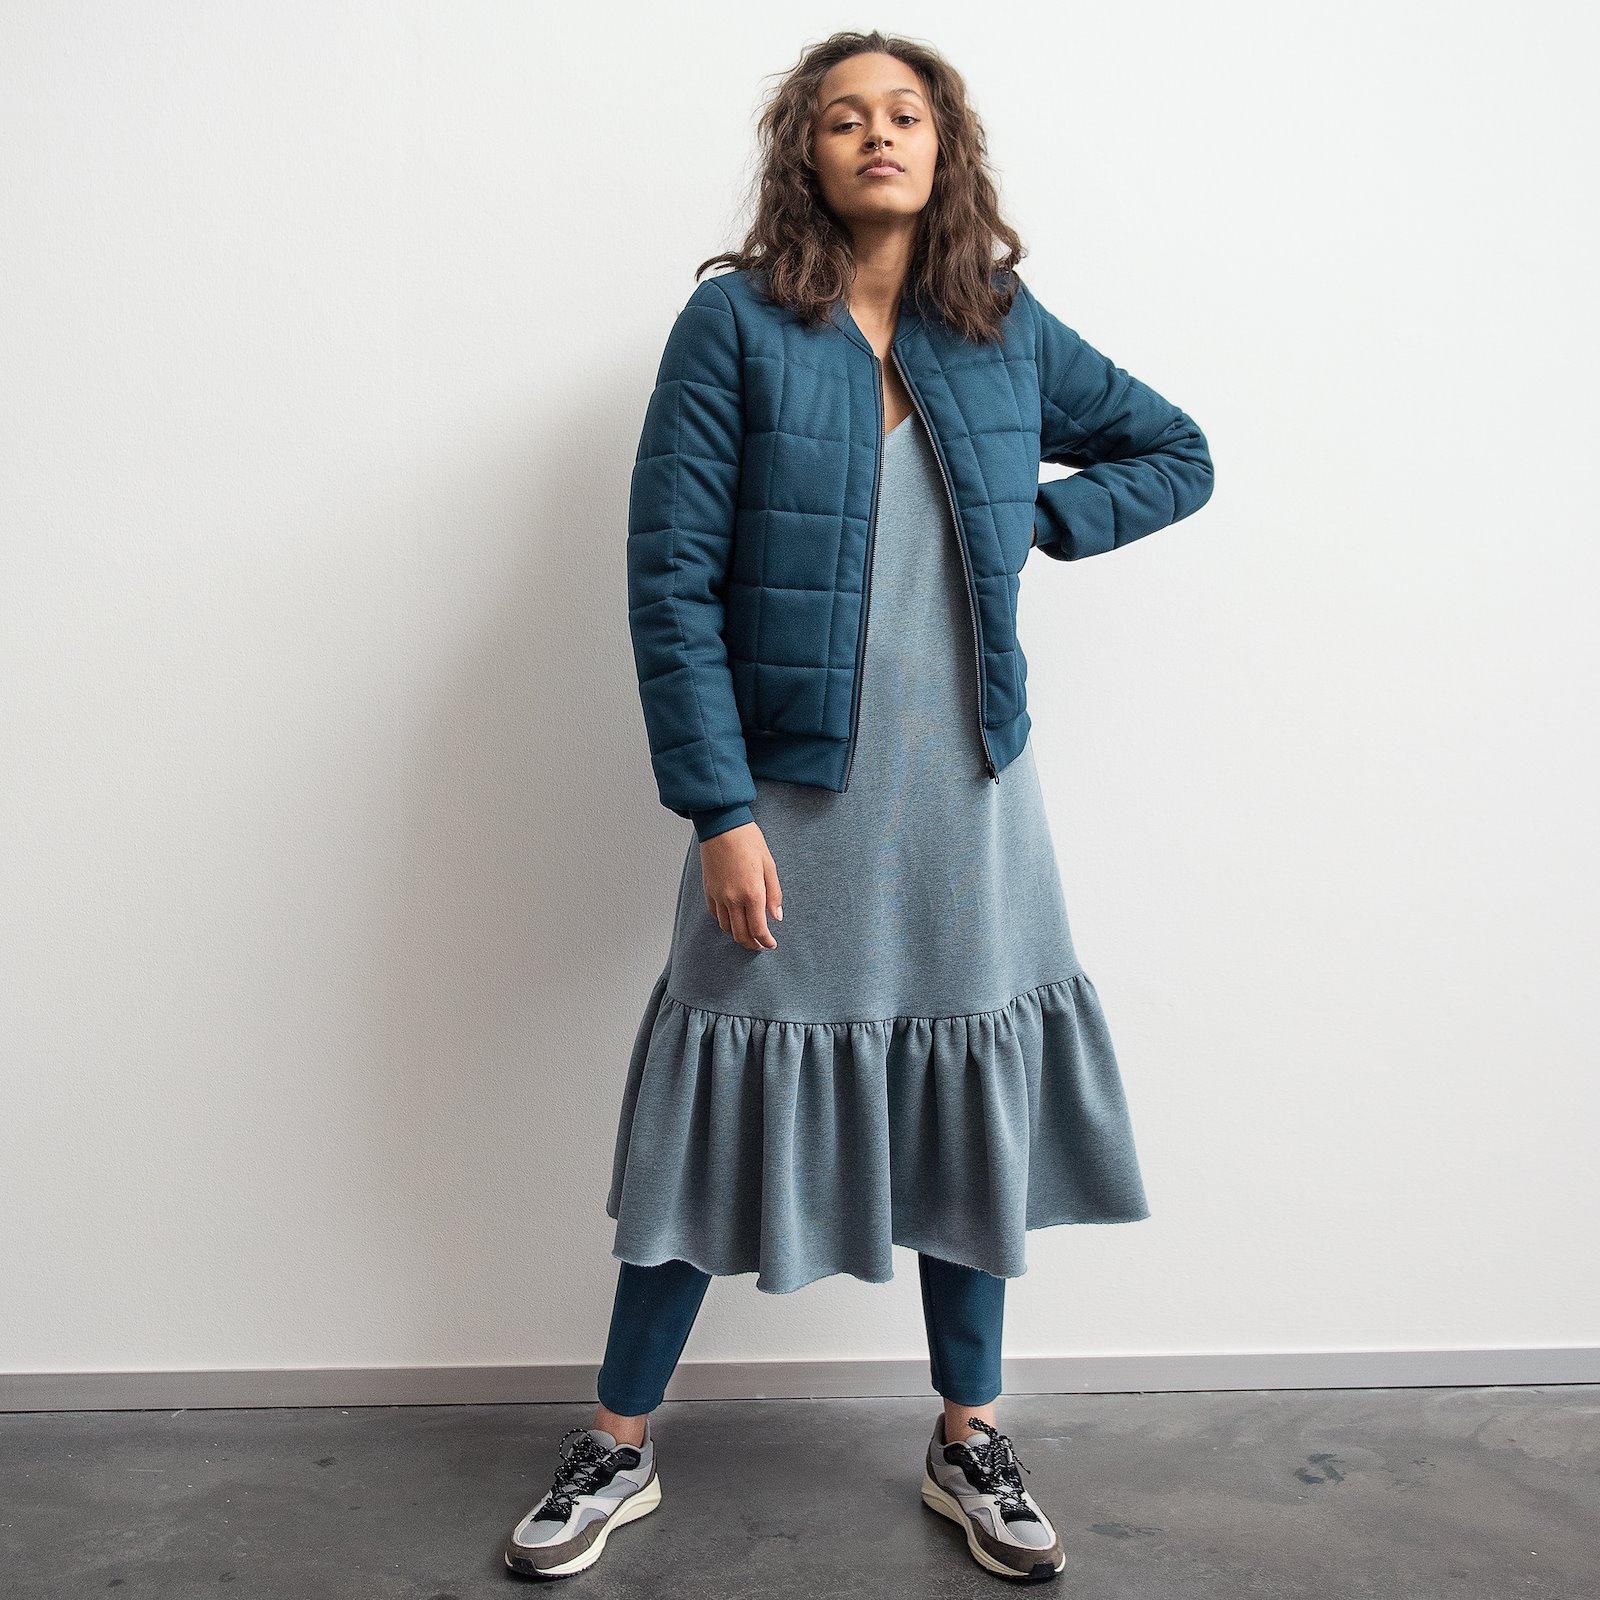 Strap dress and top, 36/8 p23146_211764_p24028_272795_9901_7029_p20050_272795_sskit